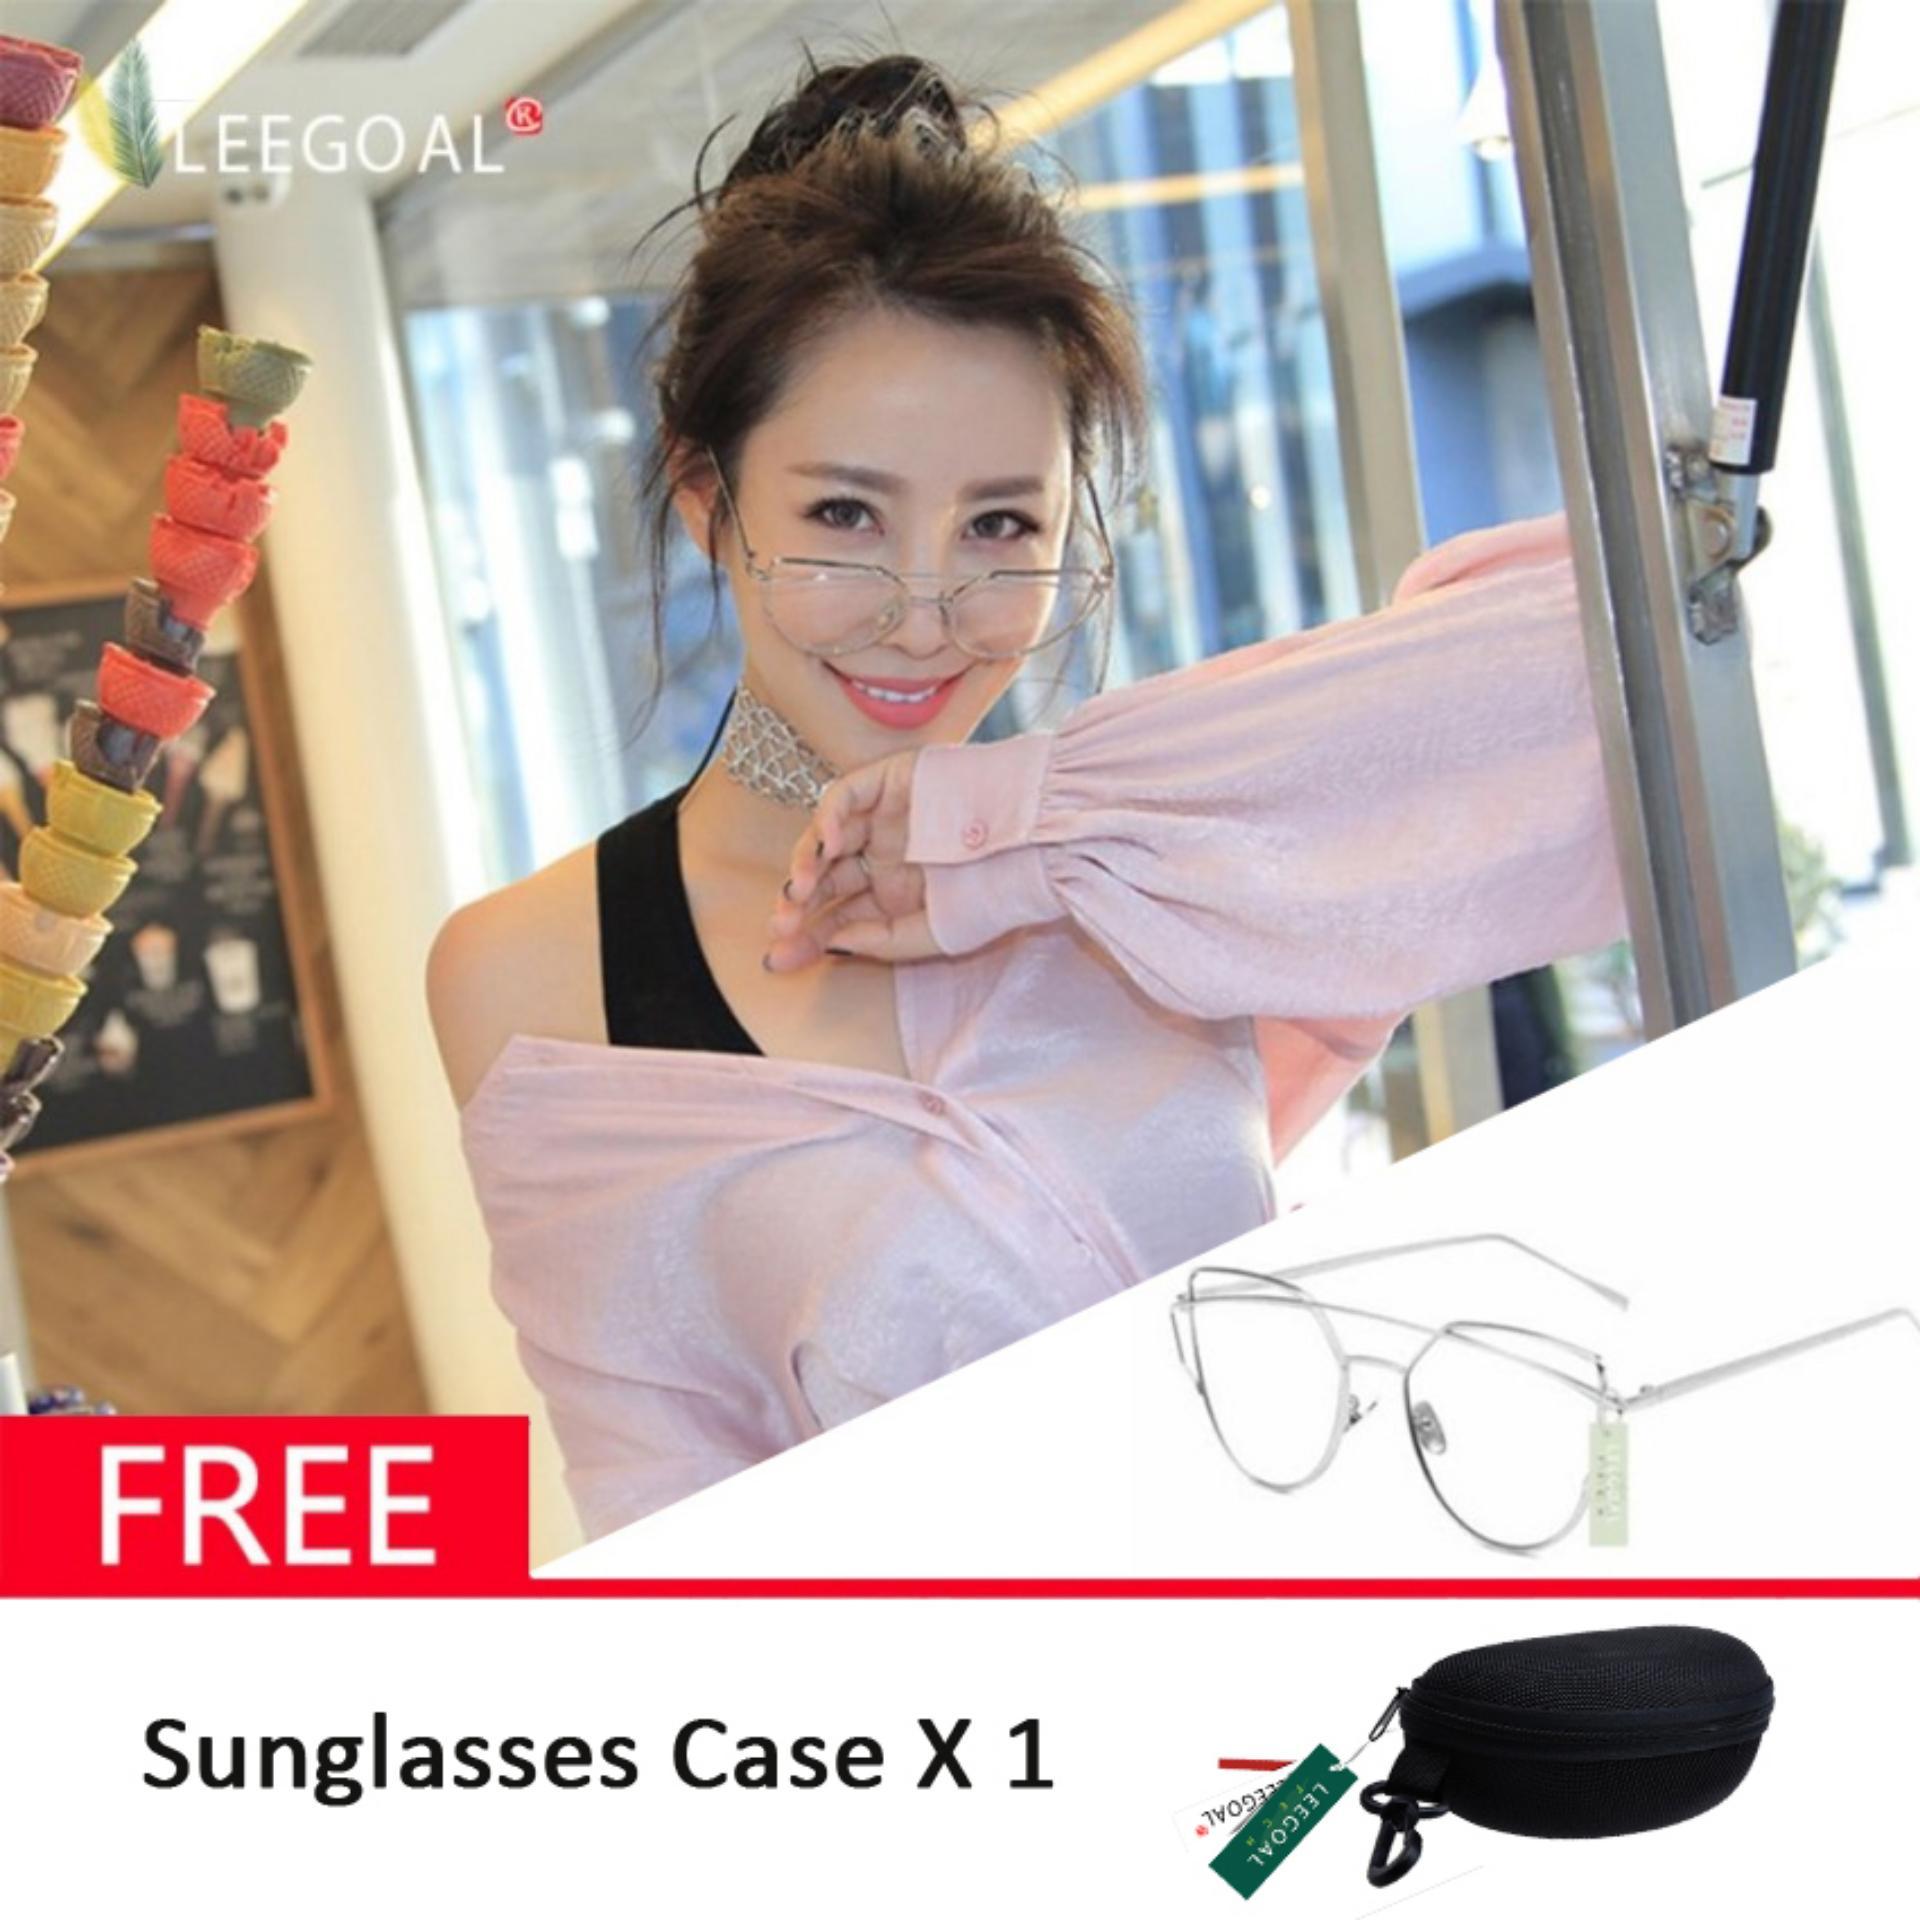 Rp 73.800. Leegoal wanita kacamata hitam Sunscreen Anti - UV warna Film kacamata busana, Sliver dan ...